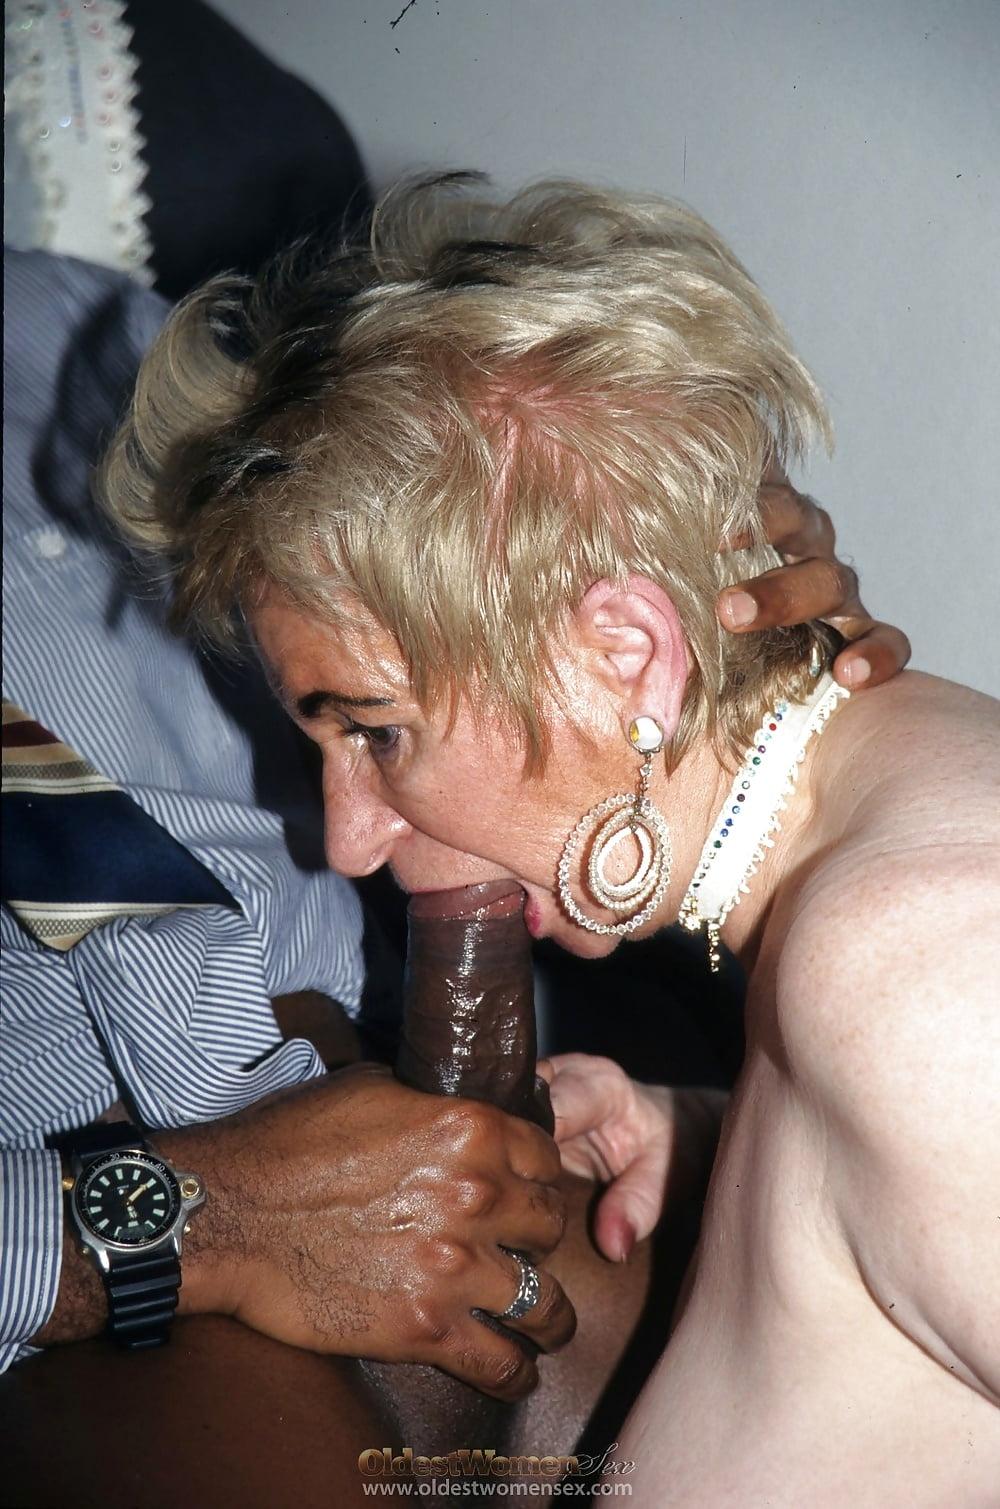 Granny cum mouth free sex pics